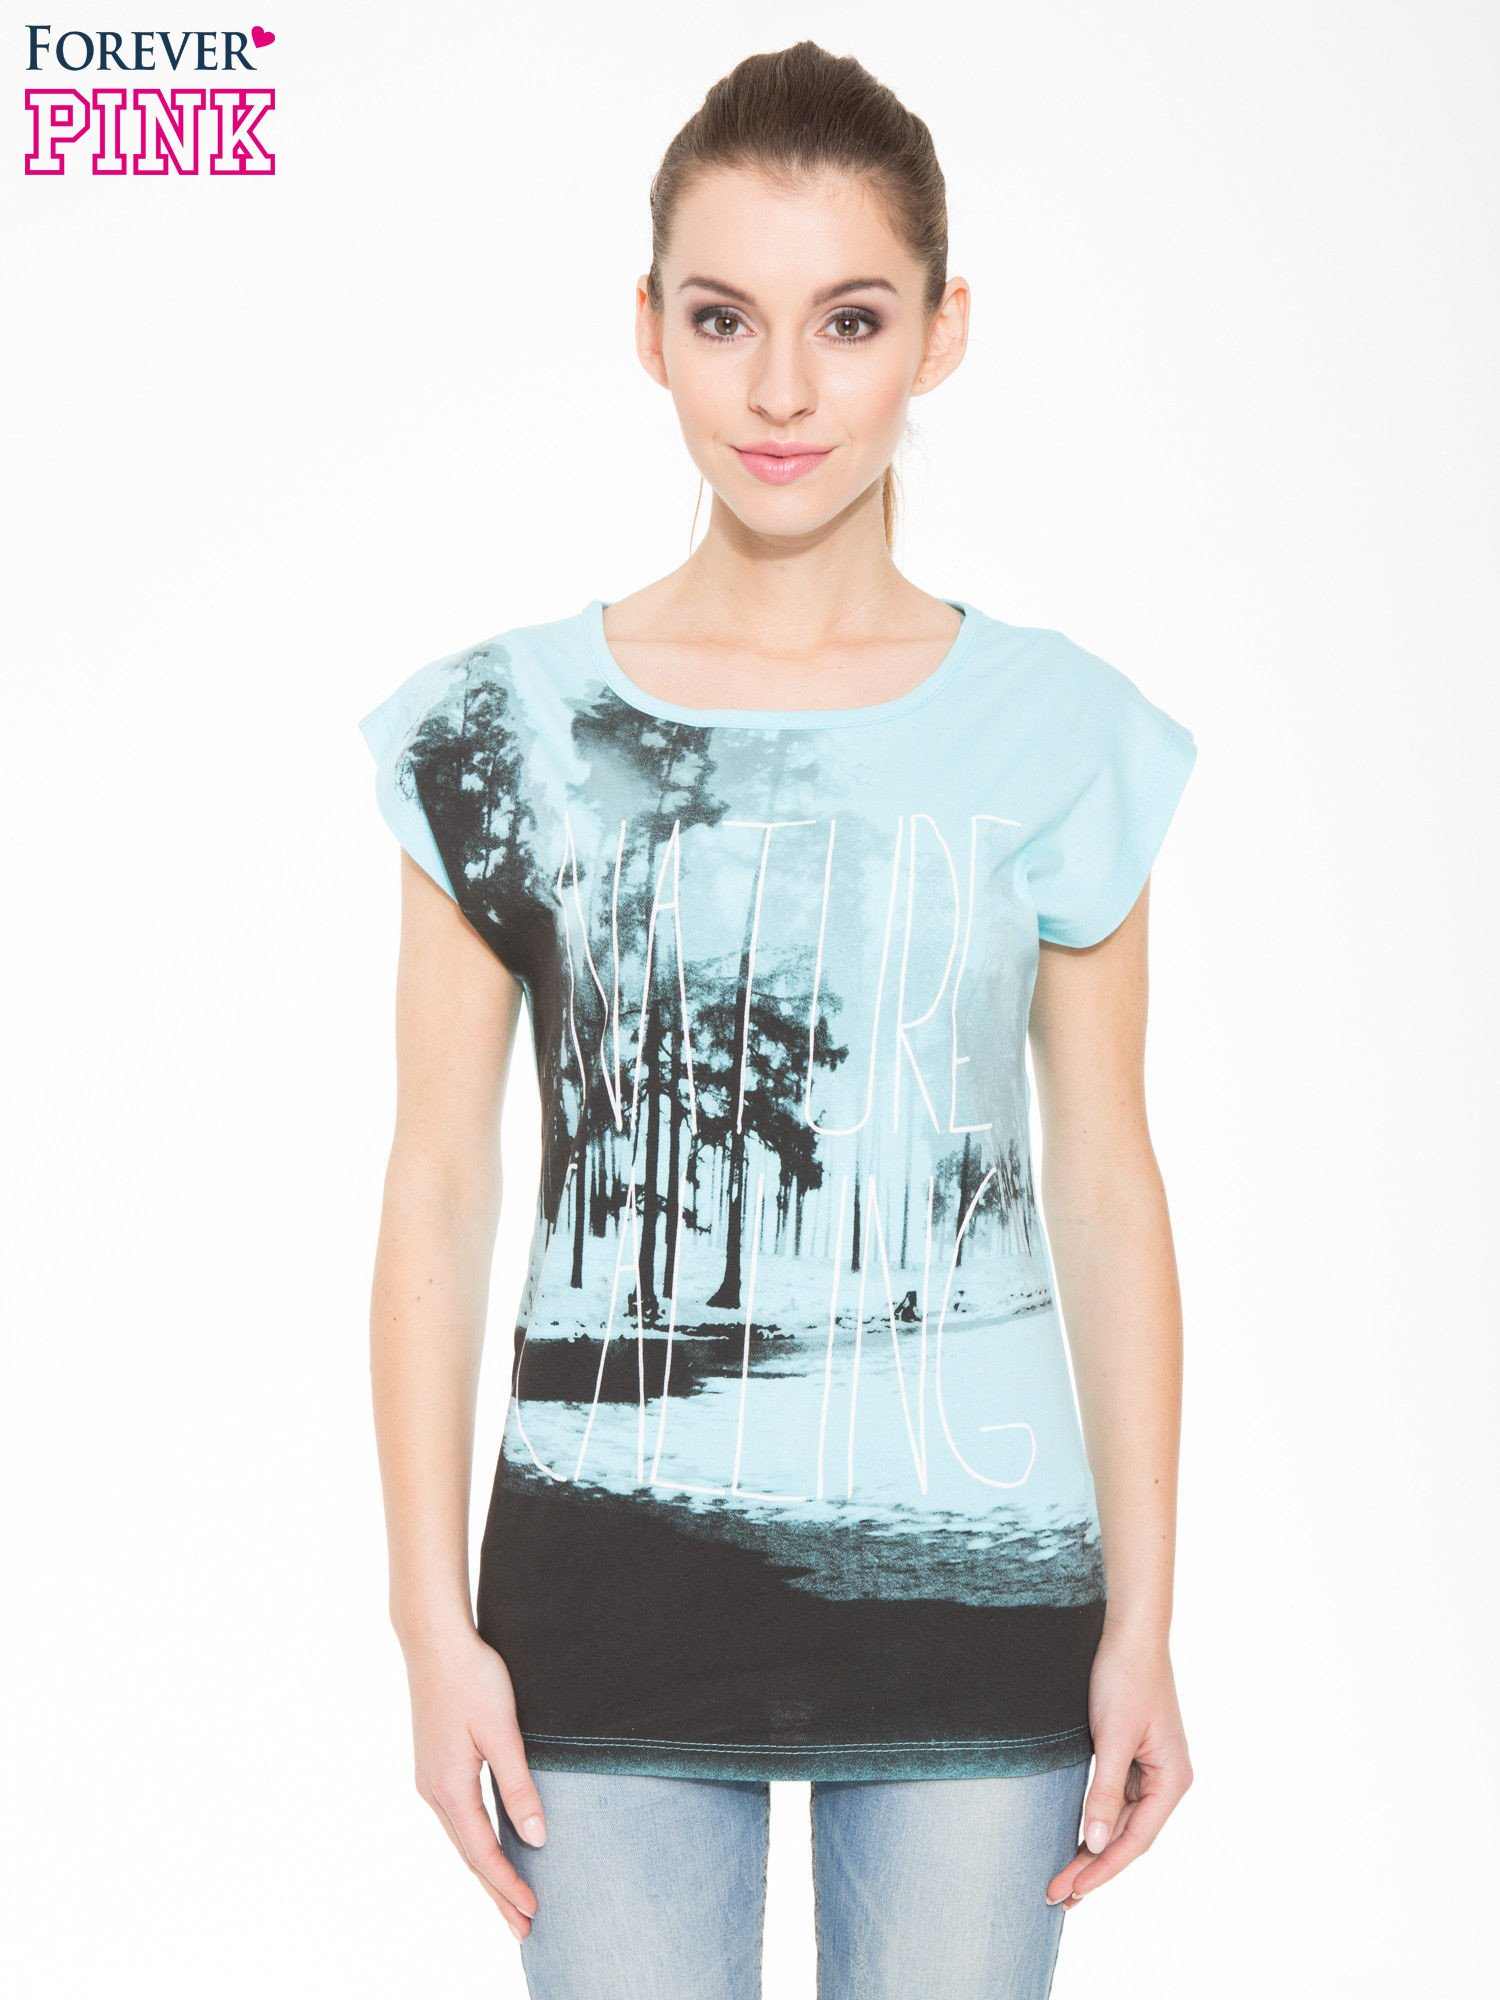 Jasnoniebieski t-shirt z nadrukiem NATURE                                  zdj.                                  1